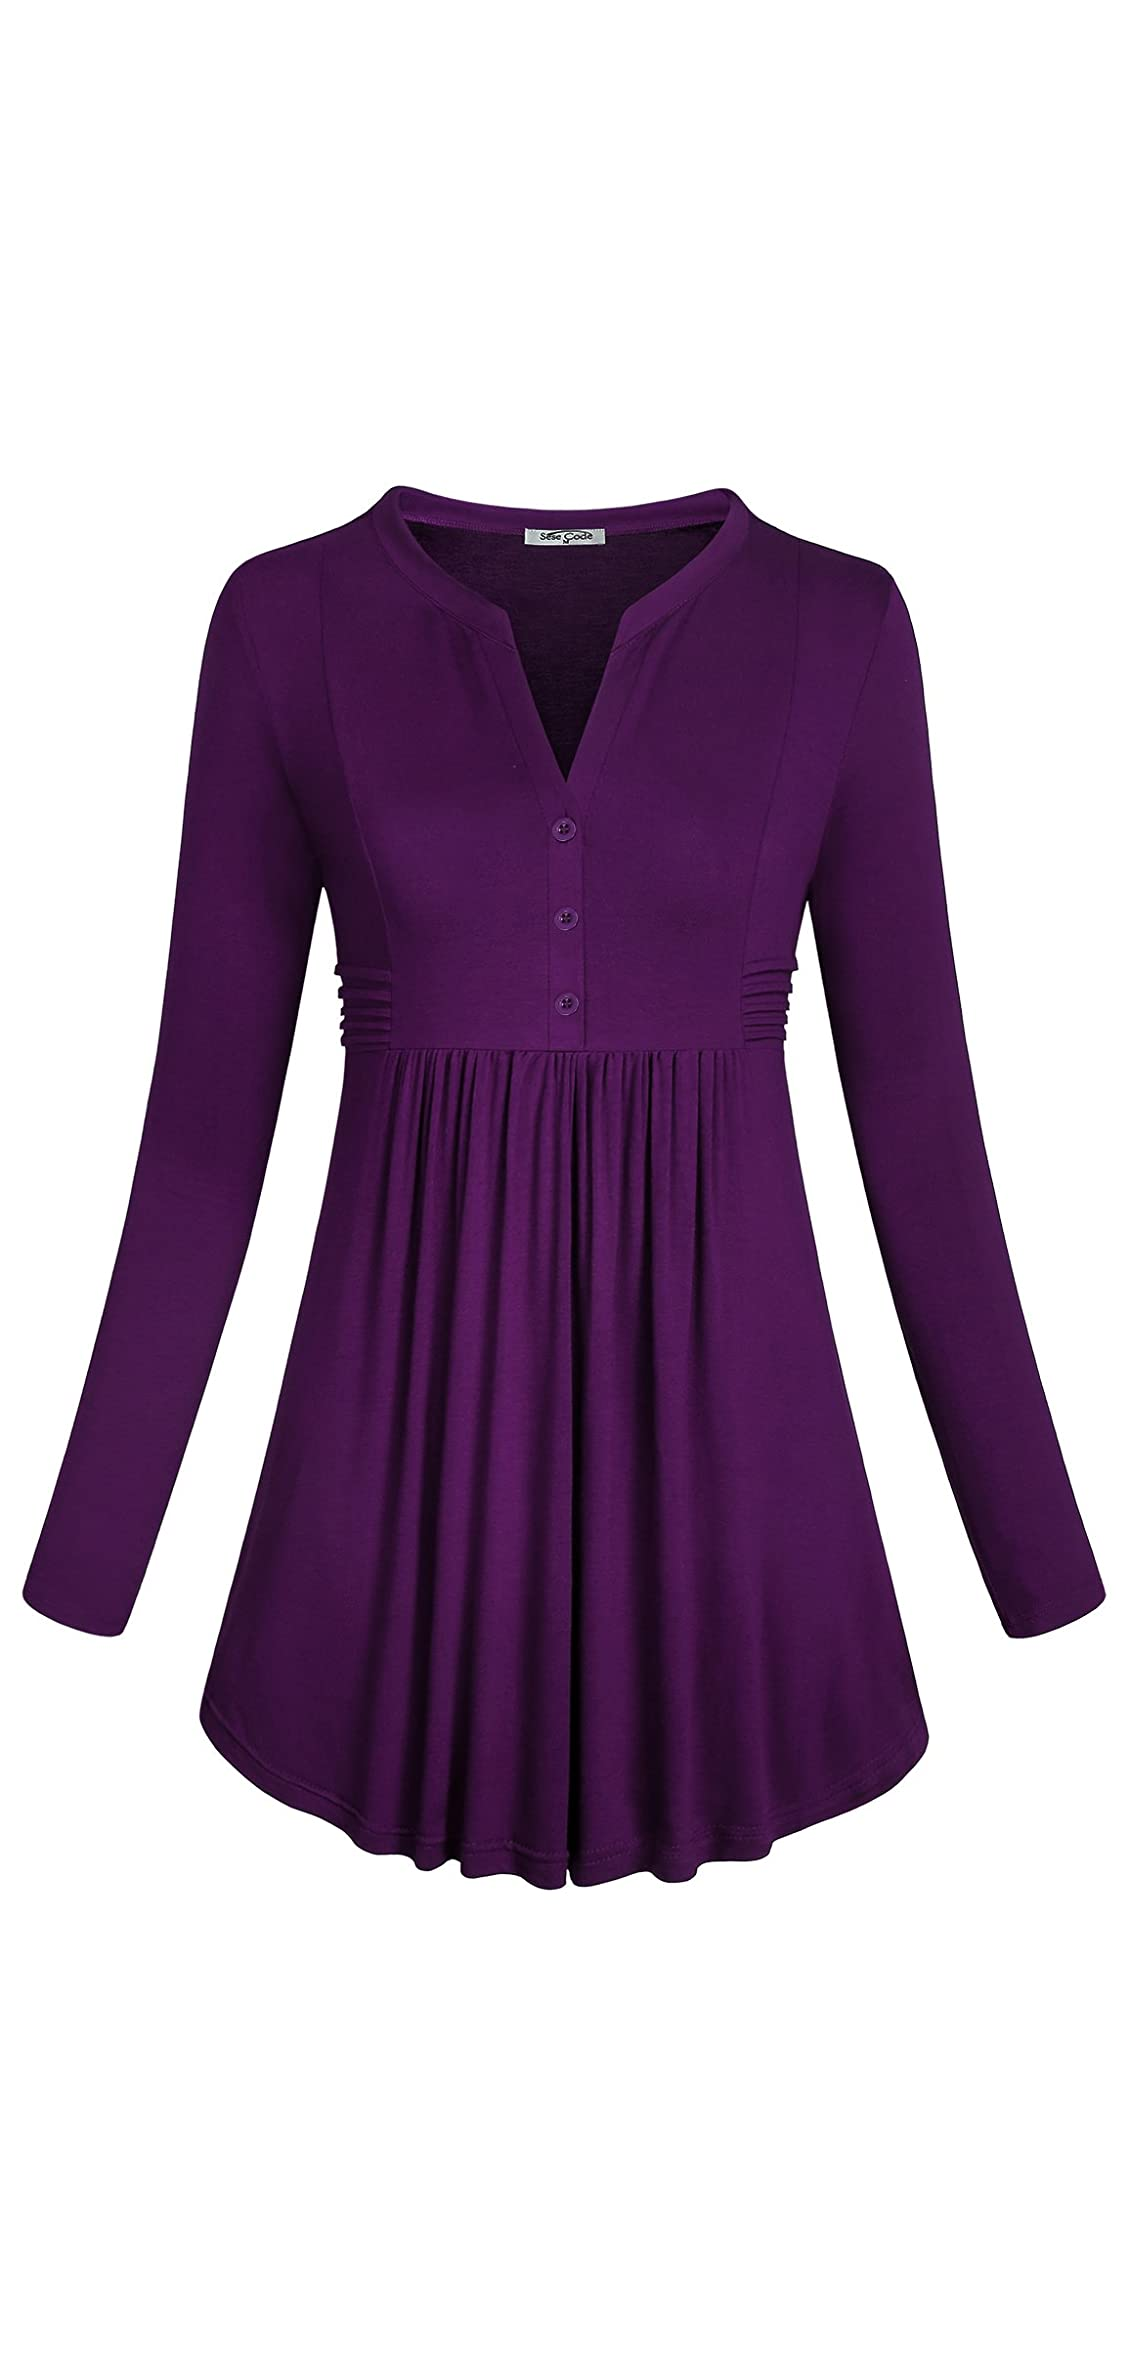 Women's Long Sleeve Mandarin Collar Shirt Pleated Tops